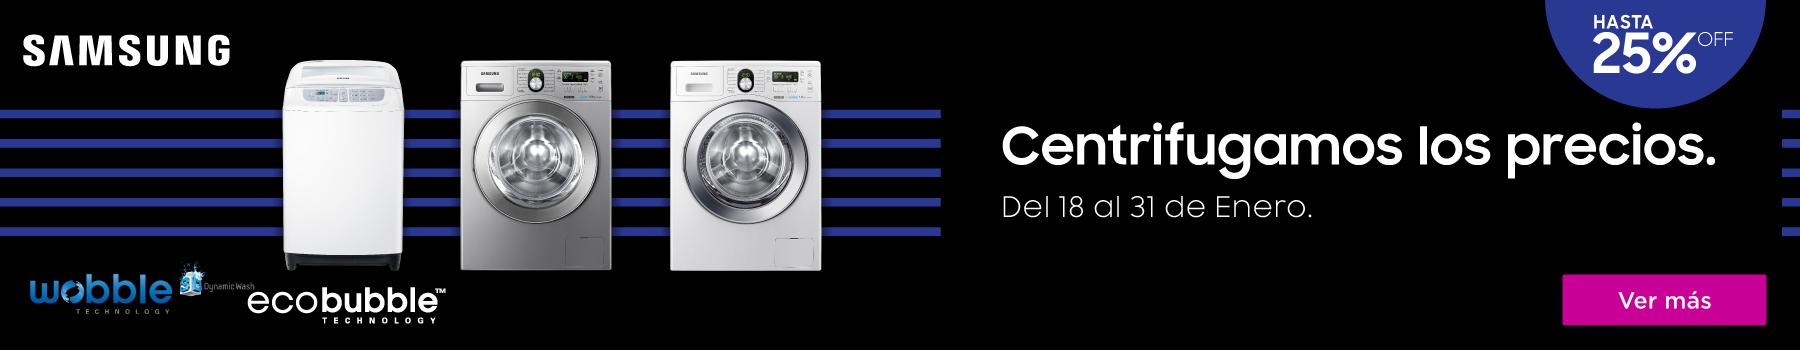 imgdesktop lavado